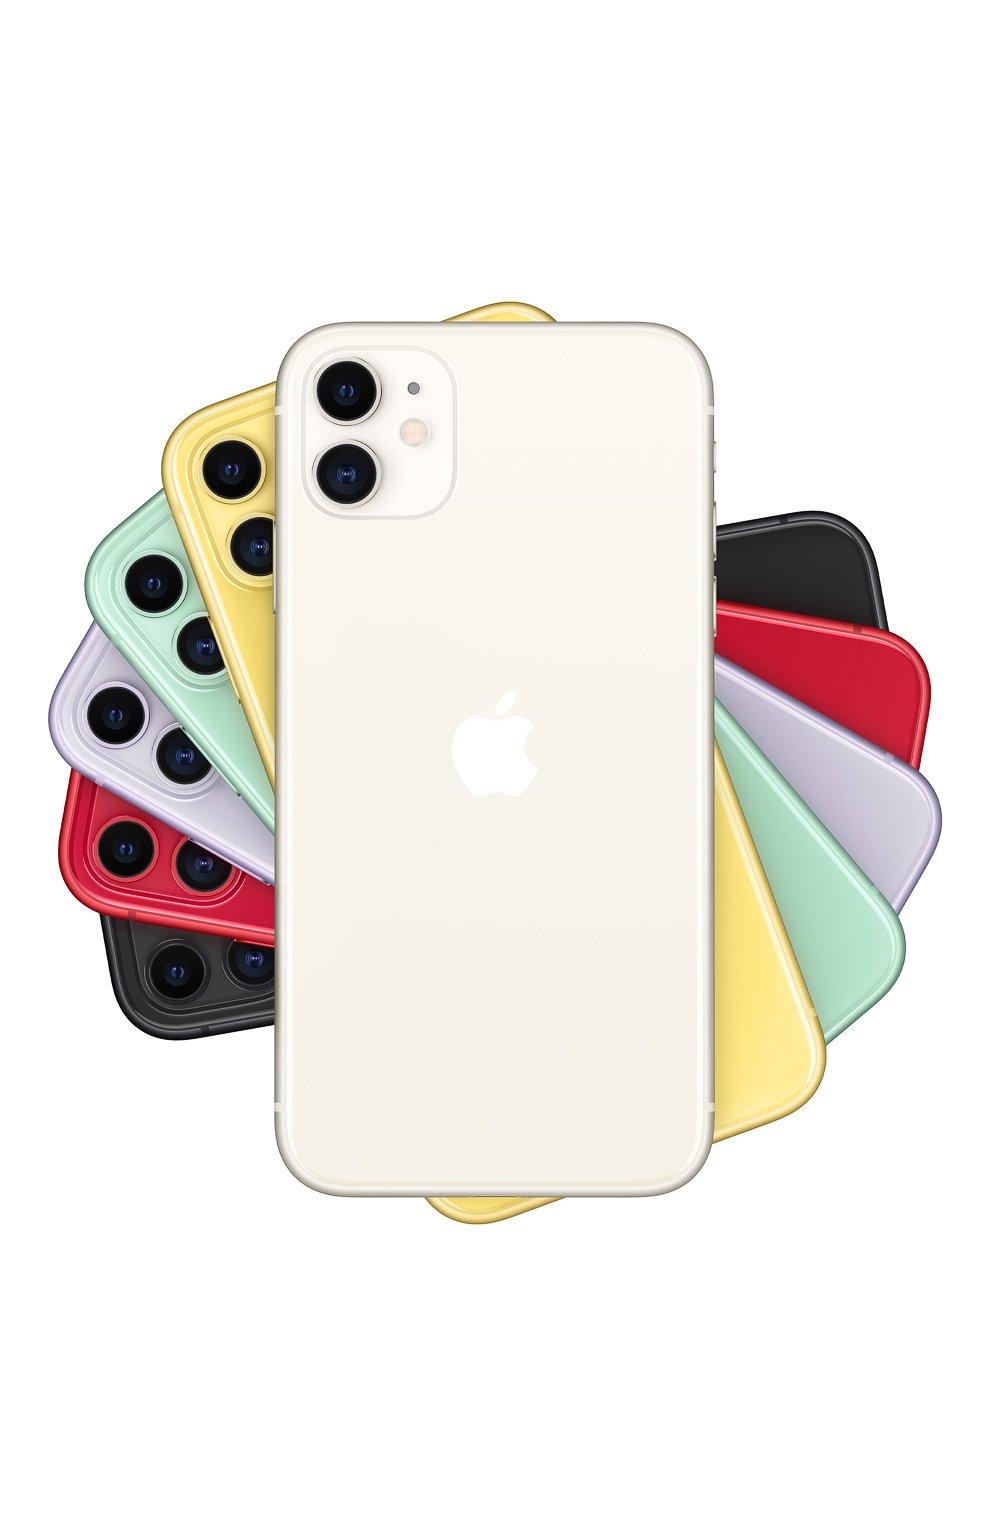 Мужской iphone 11 128gb white APPLE  white цвета, арт. MWM22RU/A | Фото 1